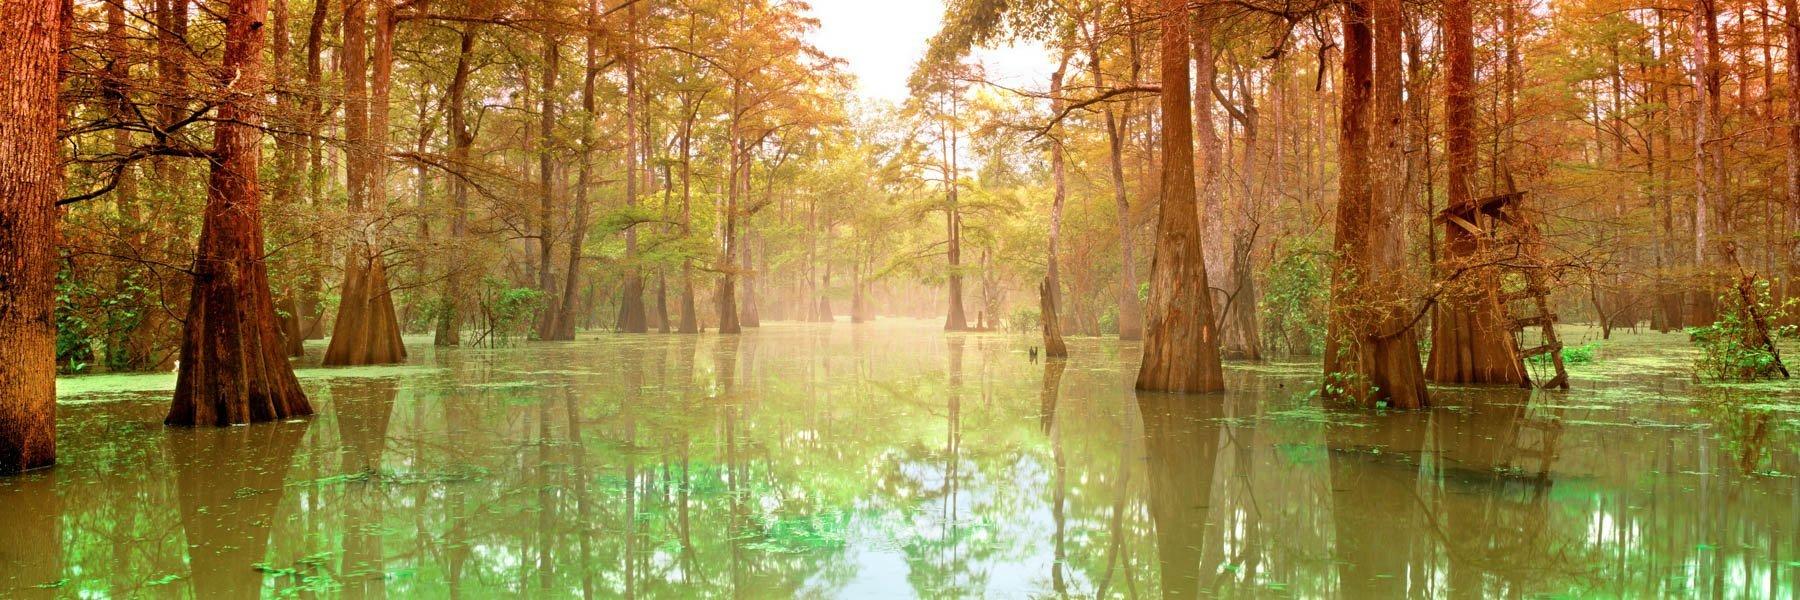 A misty morning in the bayou, Louisiana, USA.